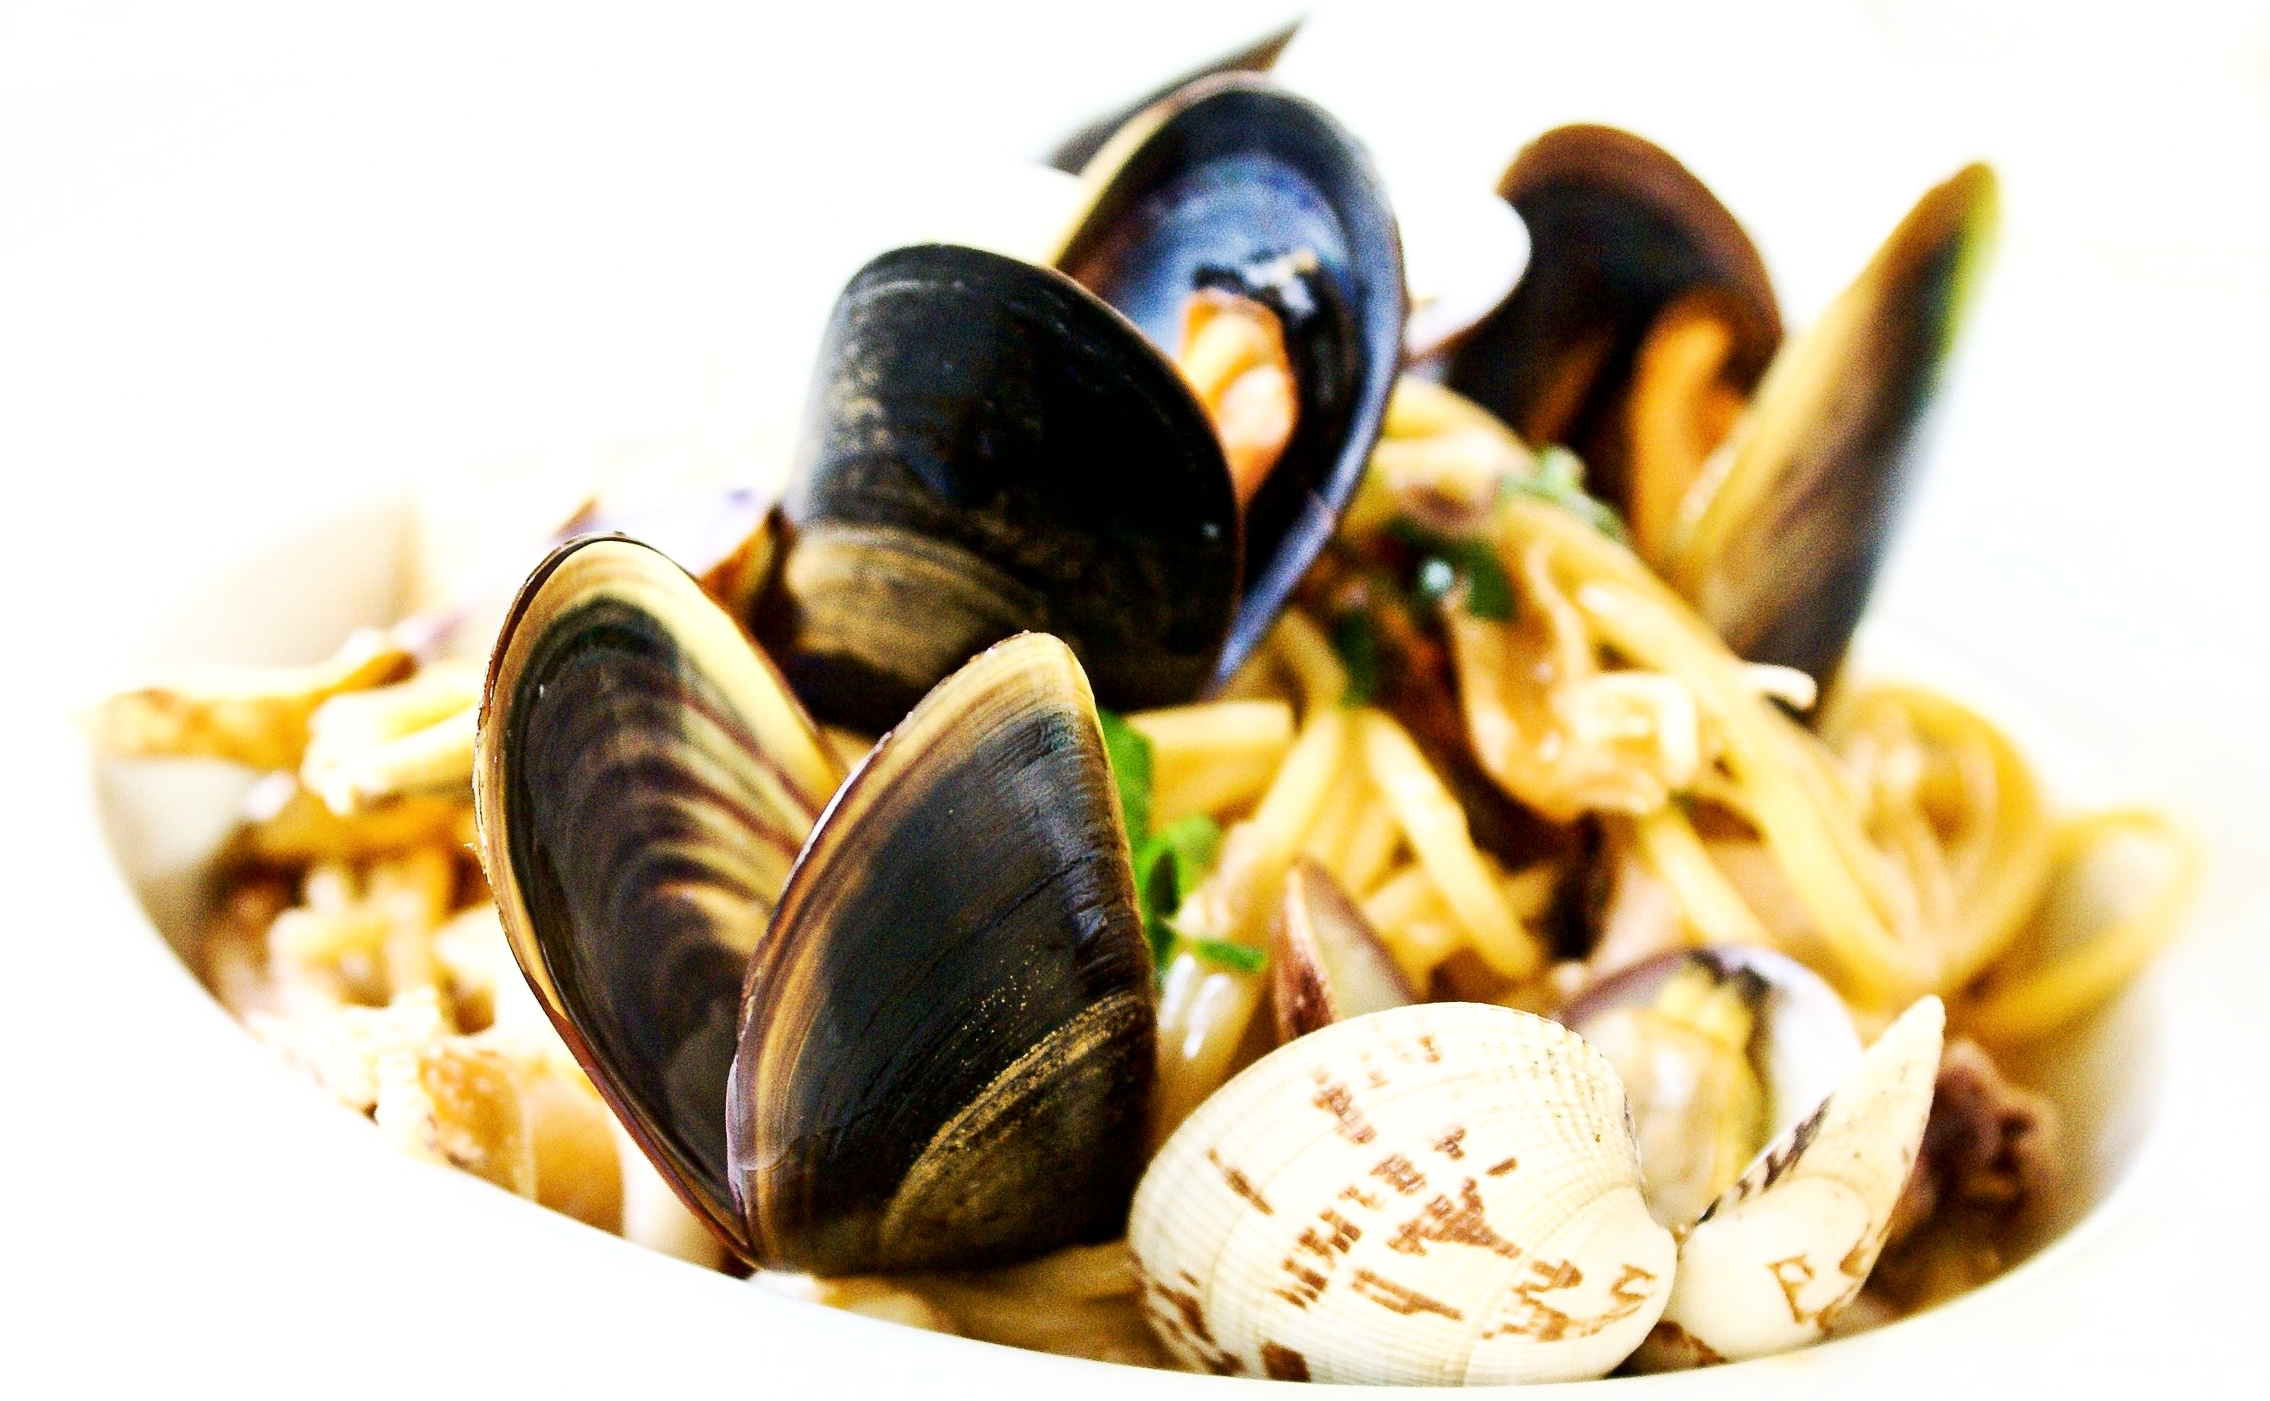 bivalve-clam-cooking-921374.jpg